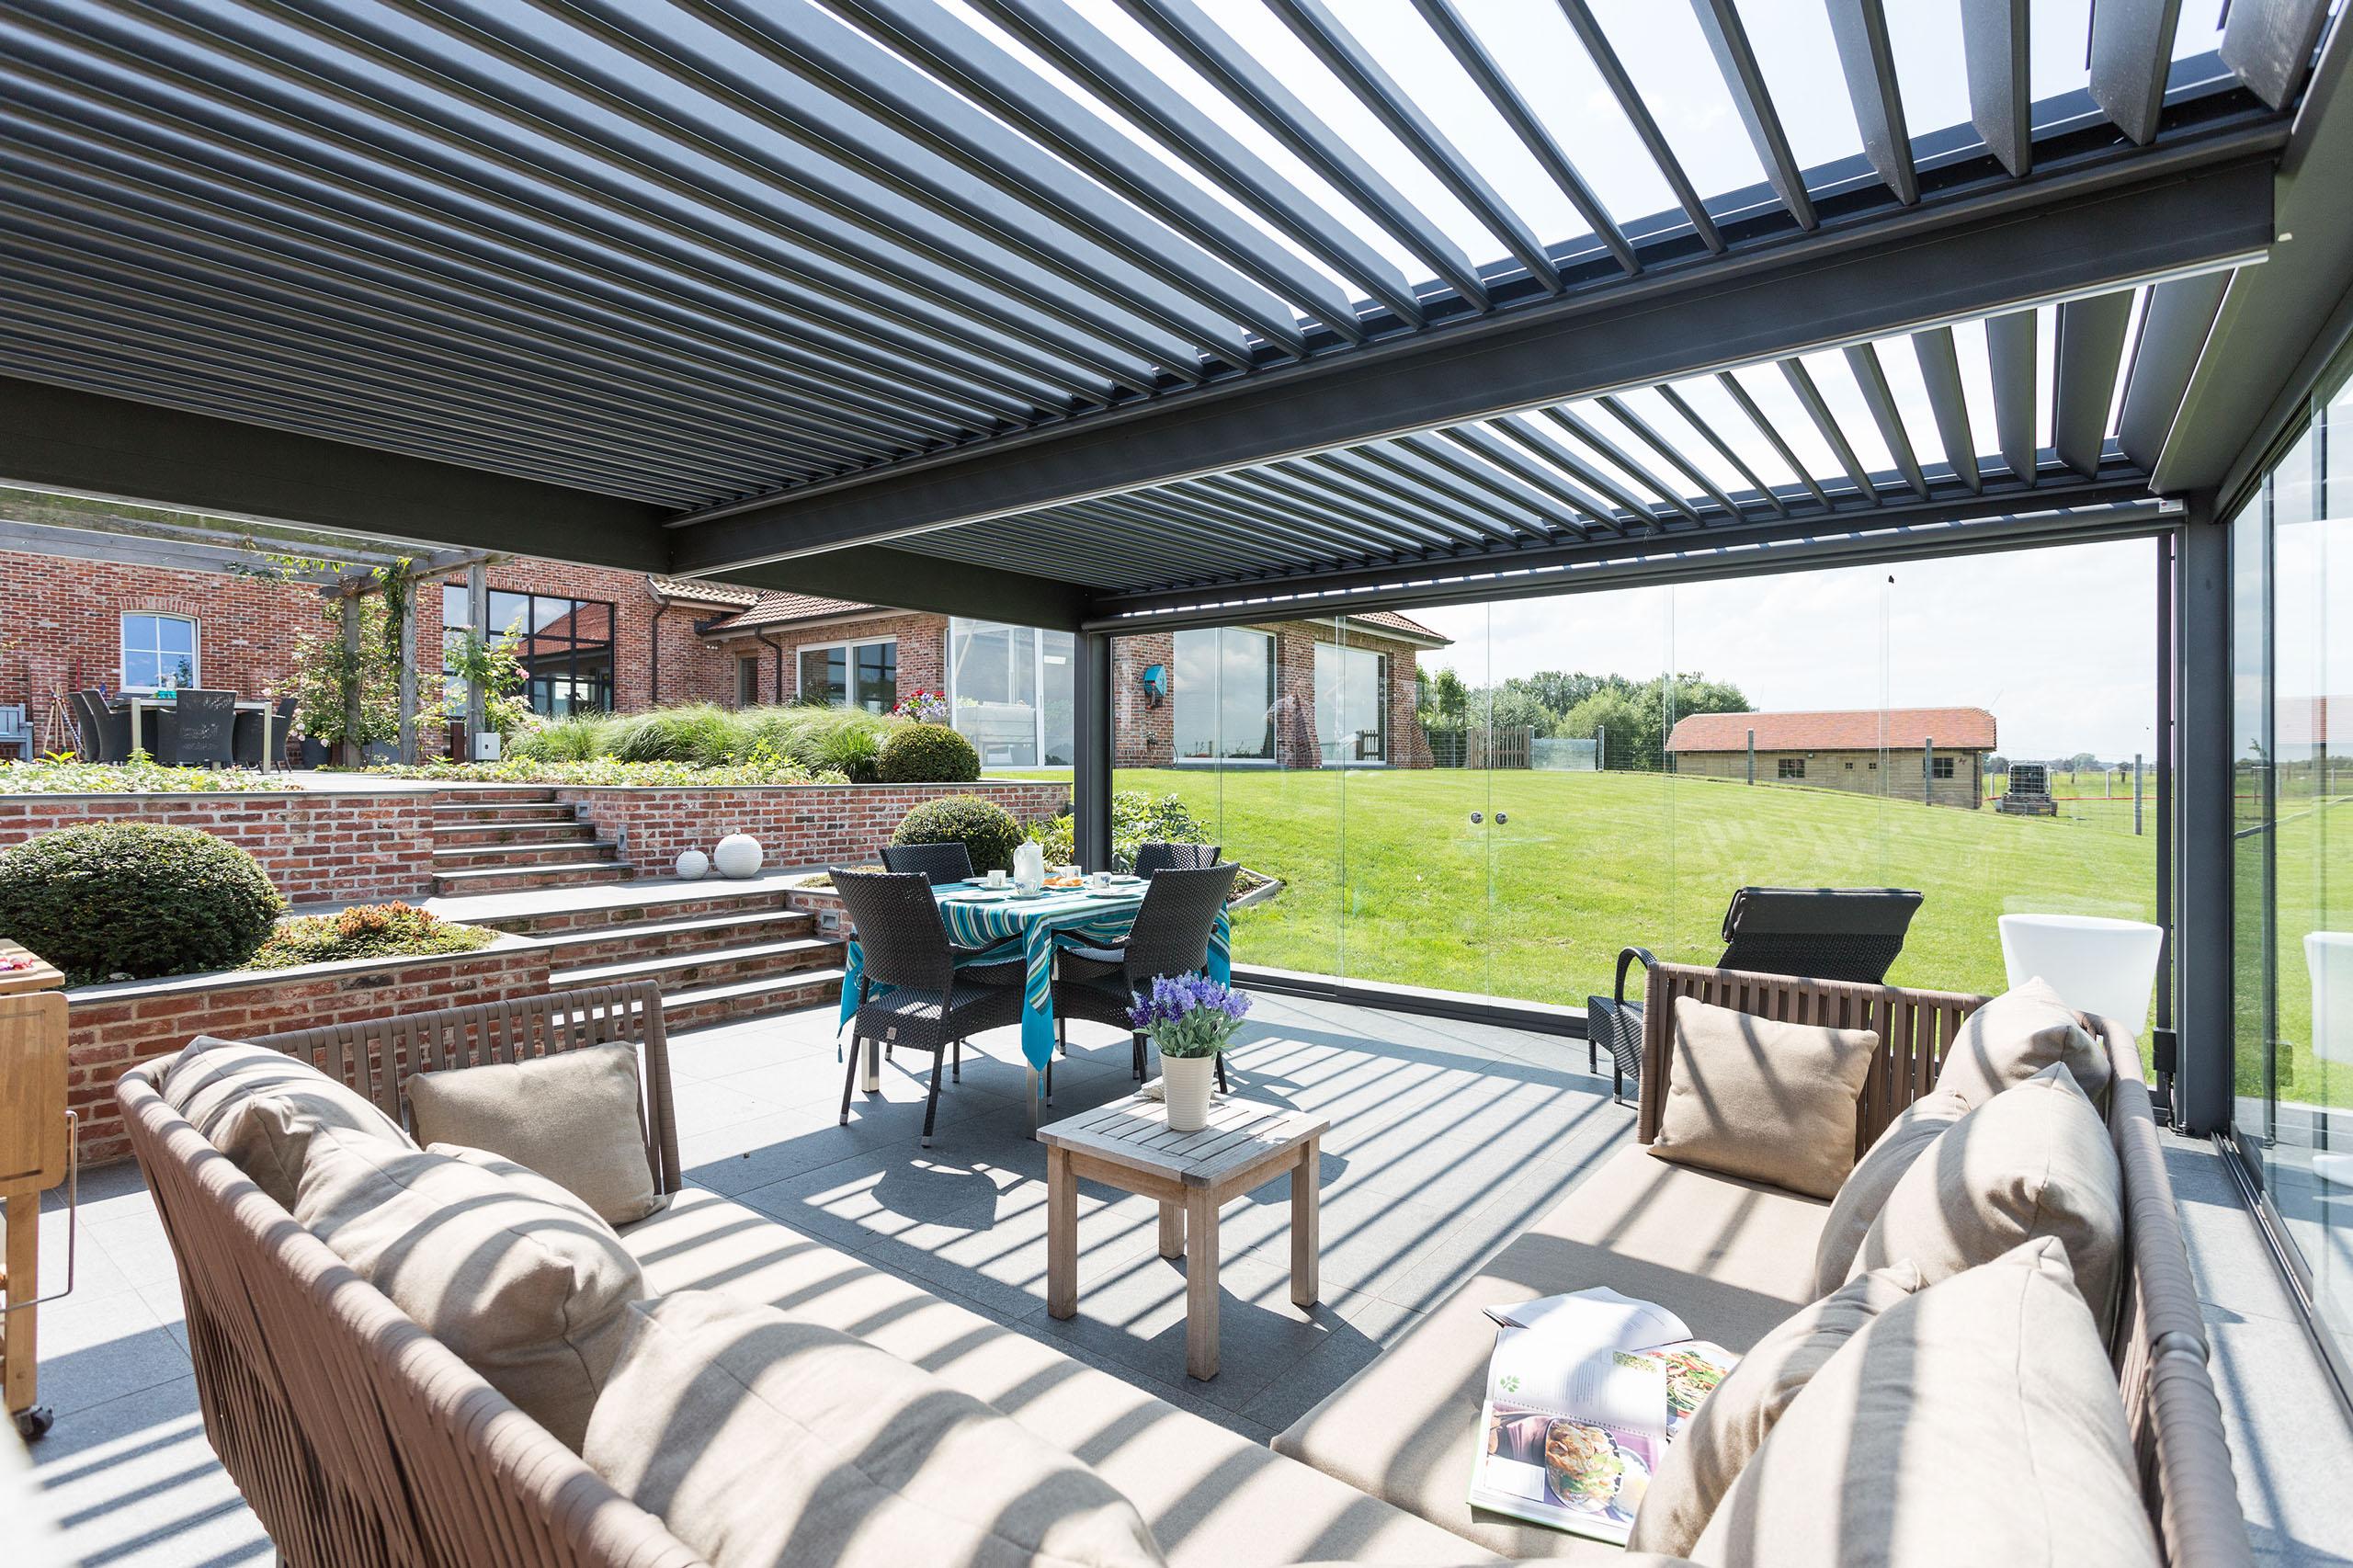 pergolas bioclimaticas sevillaglass. Black Bedroom Furniture Sets. Home Design Ideas